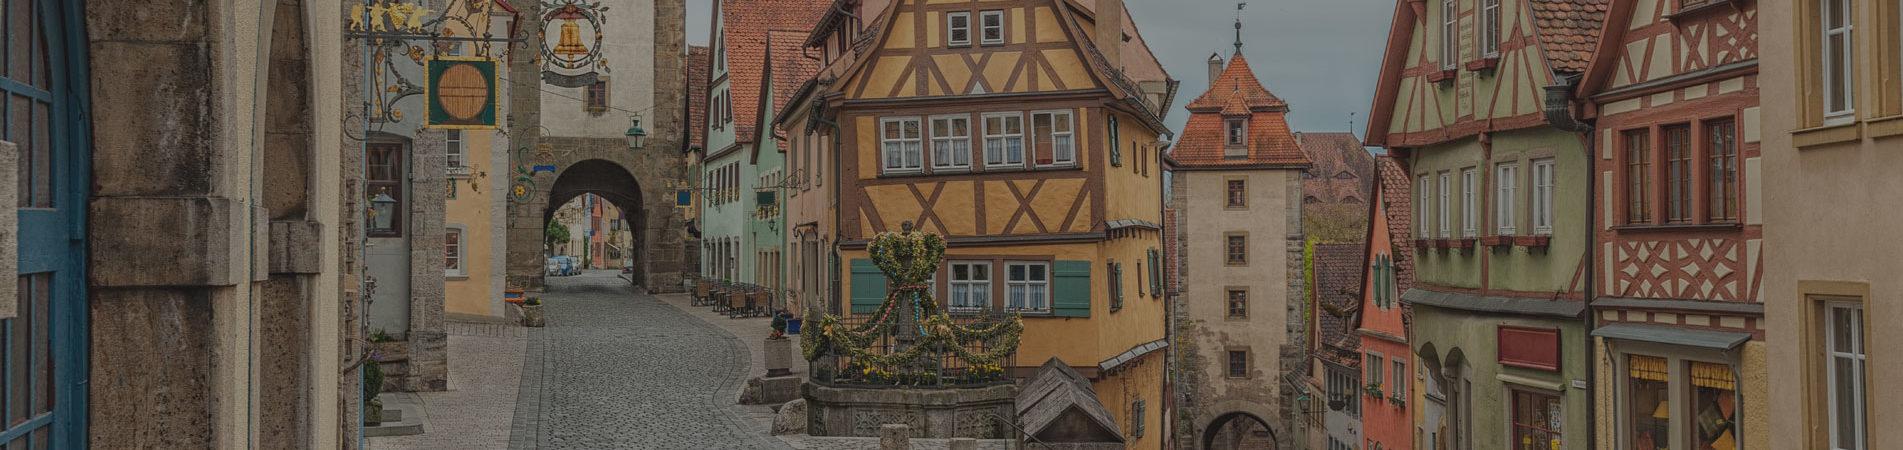 Germany Wide